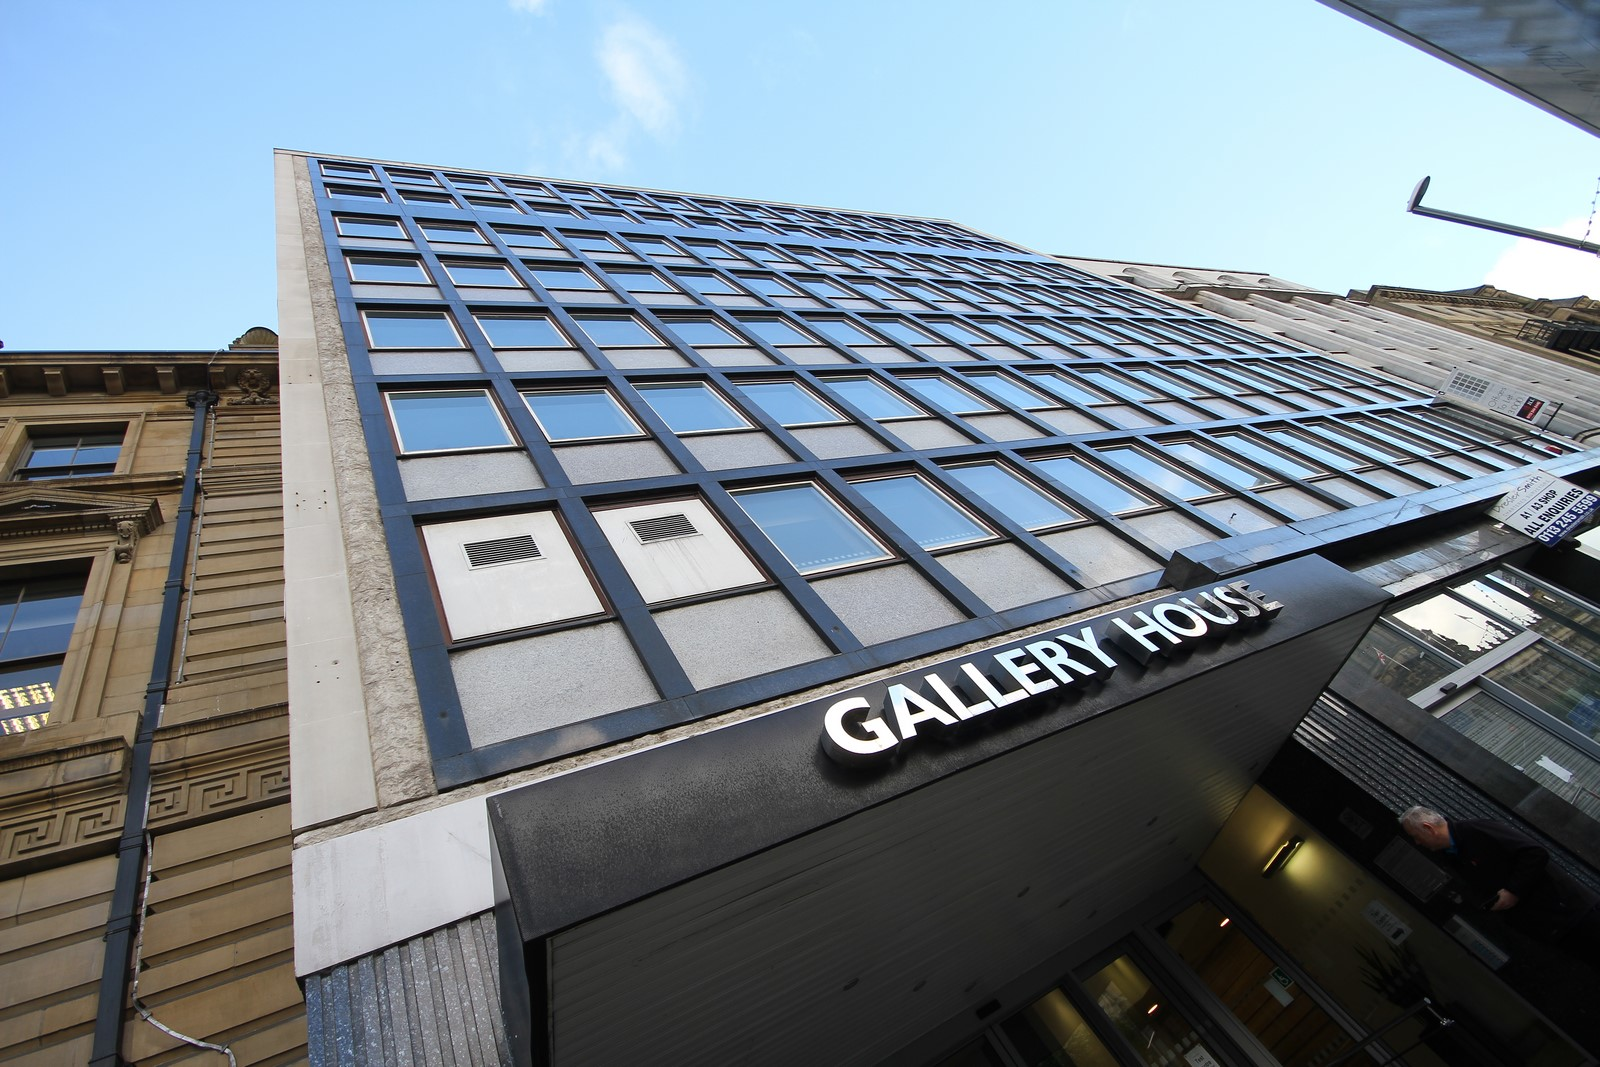 Gallery_House_Leeds